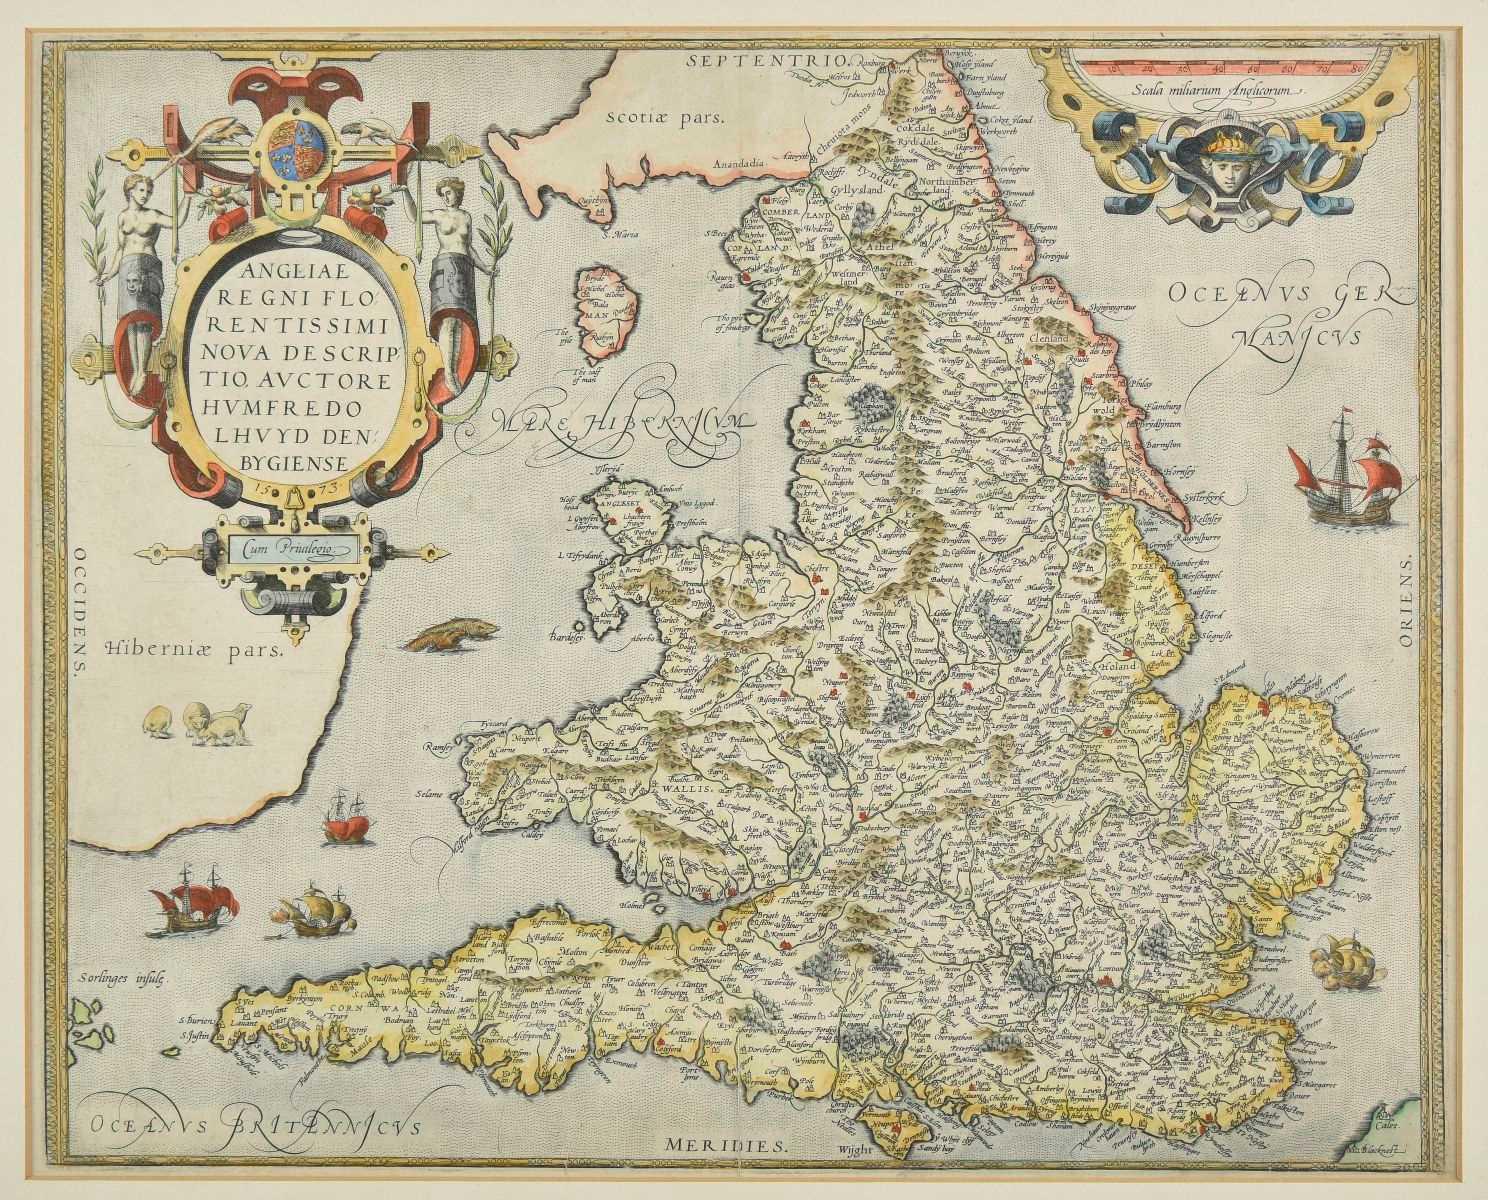 Lot 35-England & Wales. Ortelius (Abraham), Angliae Regni Florentissimi nova descriptio..., 1573